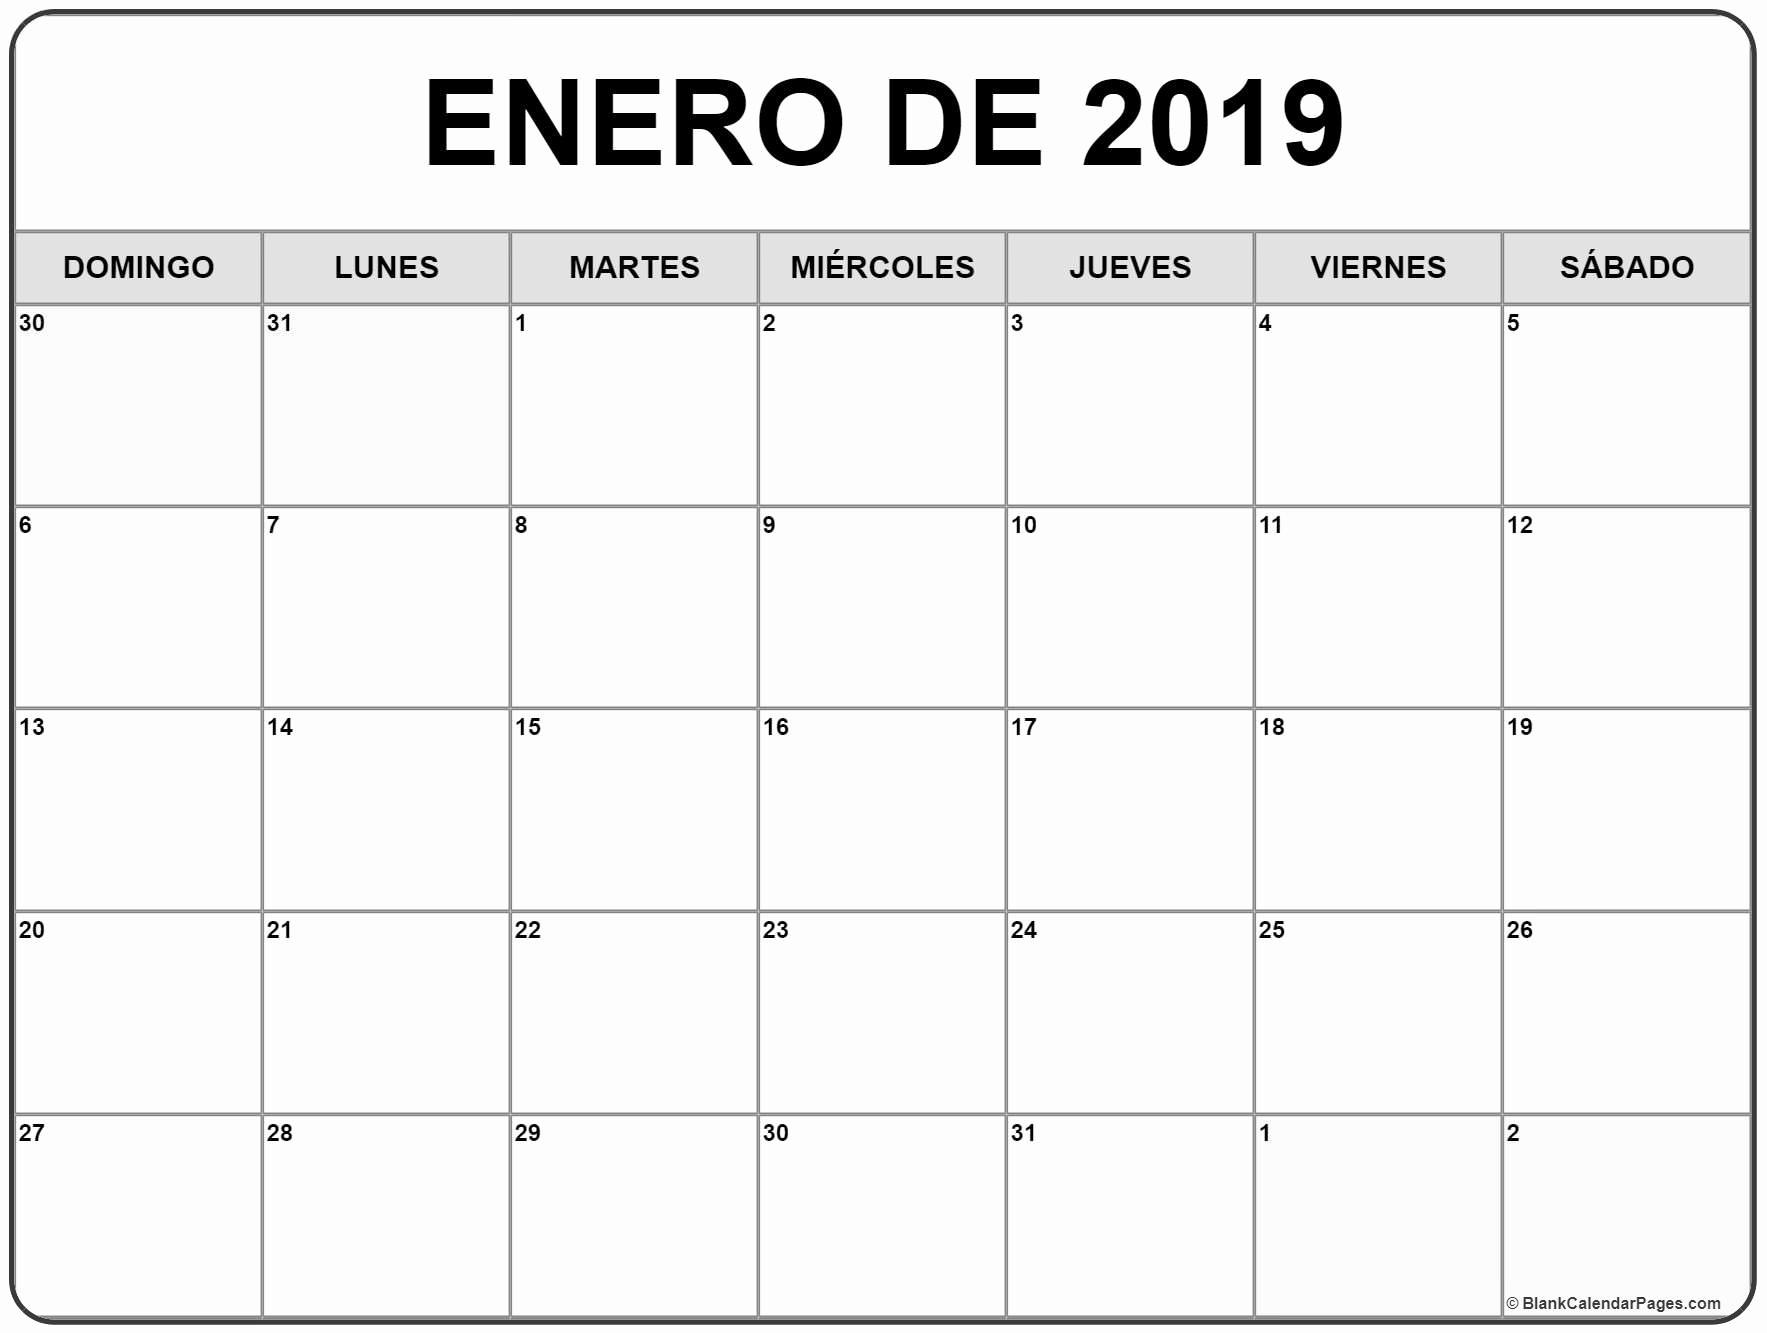 Calendario Escolar Agosto 2019 Más Arriba-a-fecha Calendario Dr 2019 Calendario 2019 Of Calendario Escolar Agosto 2019 Más Caliente Inspiraci³n 40 Ejemplo Agisto 2019